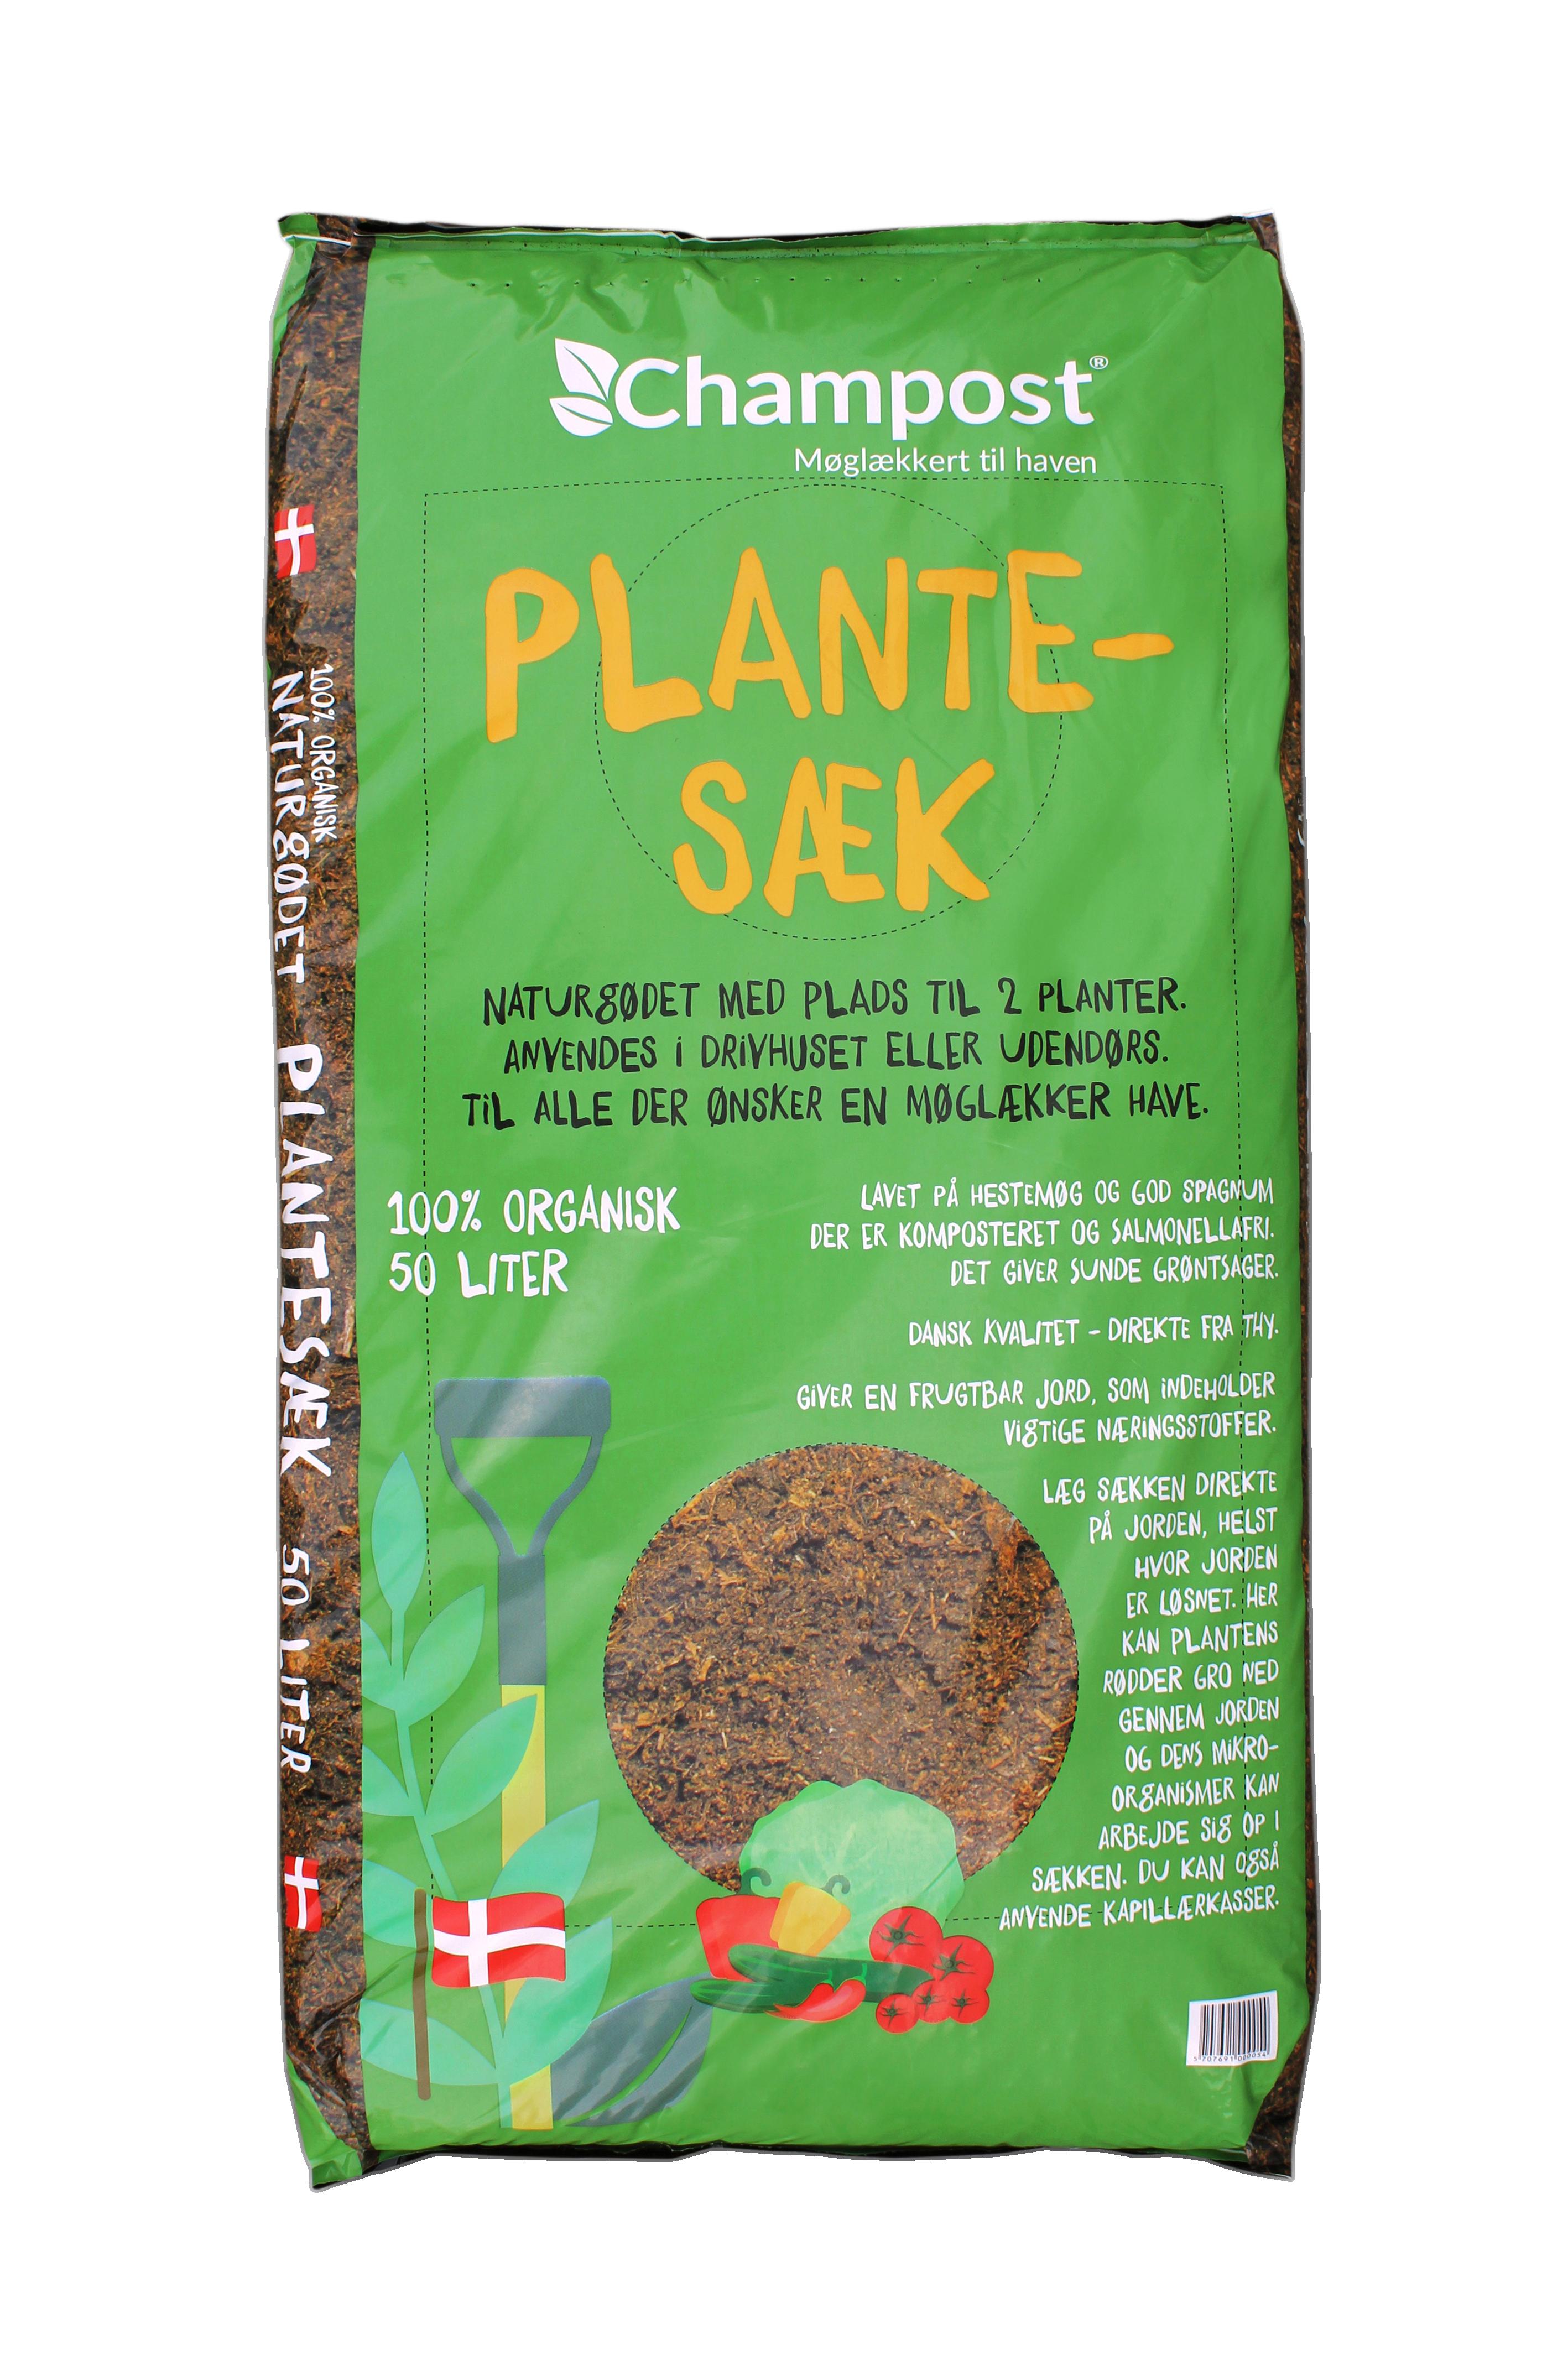 Champost plantesæk